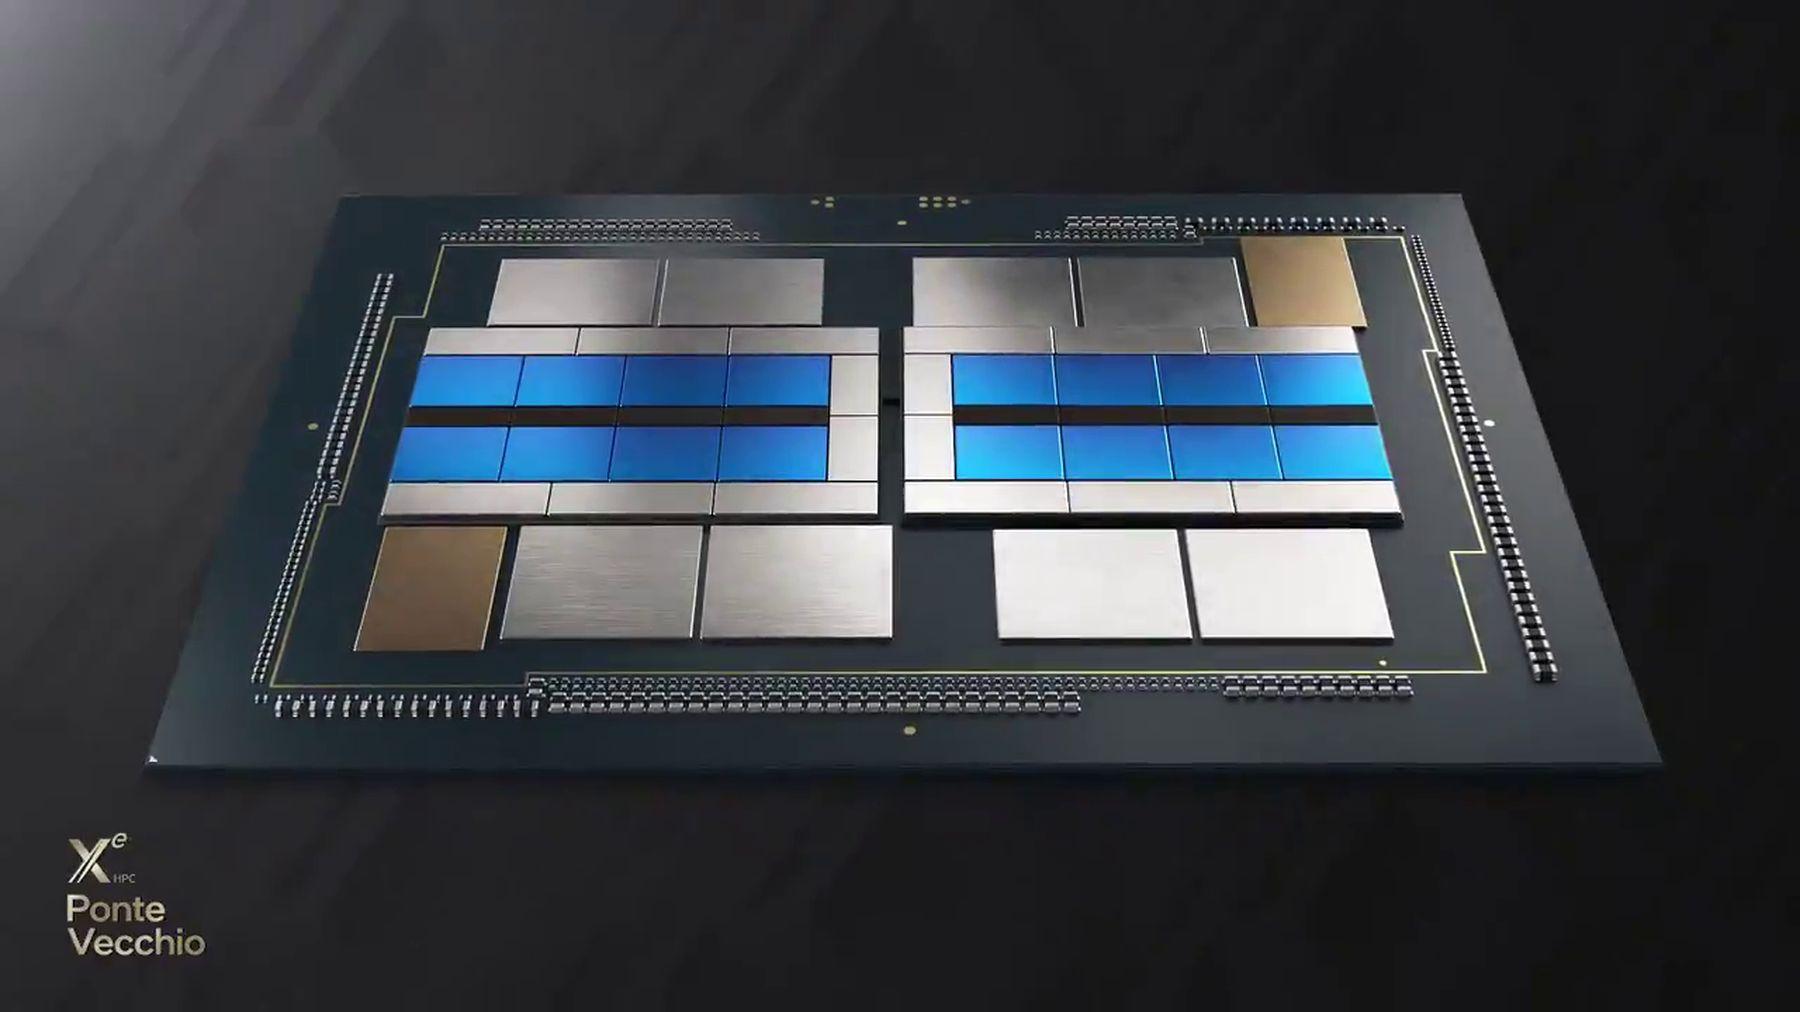 Intel Ponte Vecchio GPU (Xe-HPC) features 47 tiles and over 100 billion transitors – VideoCardz.com